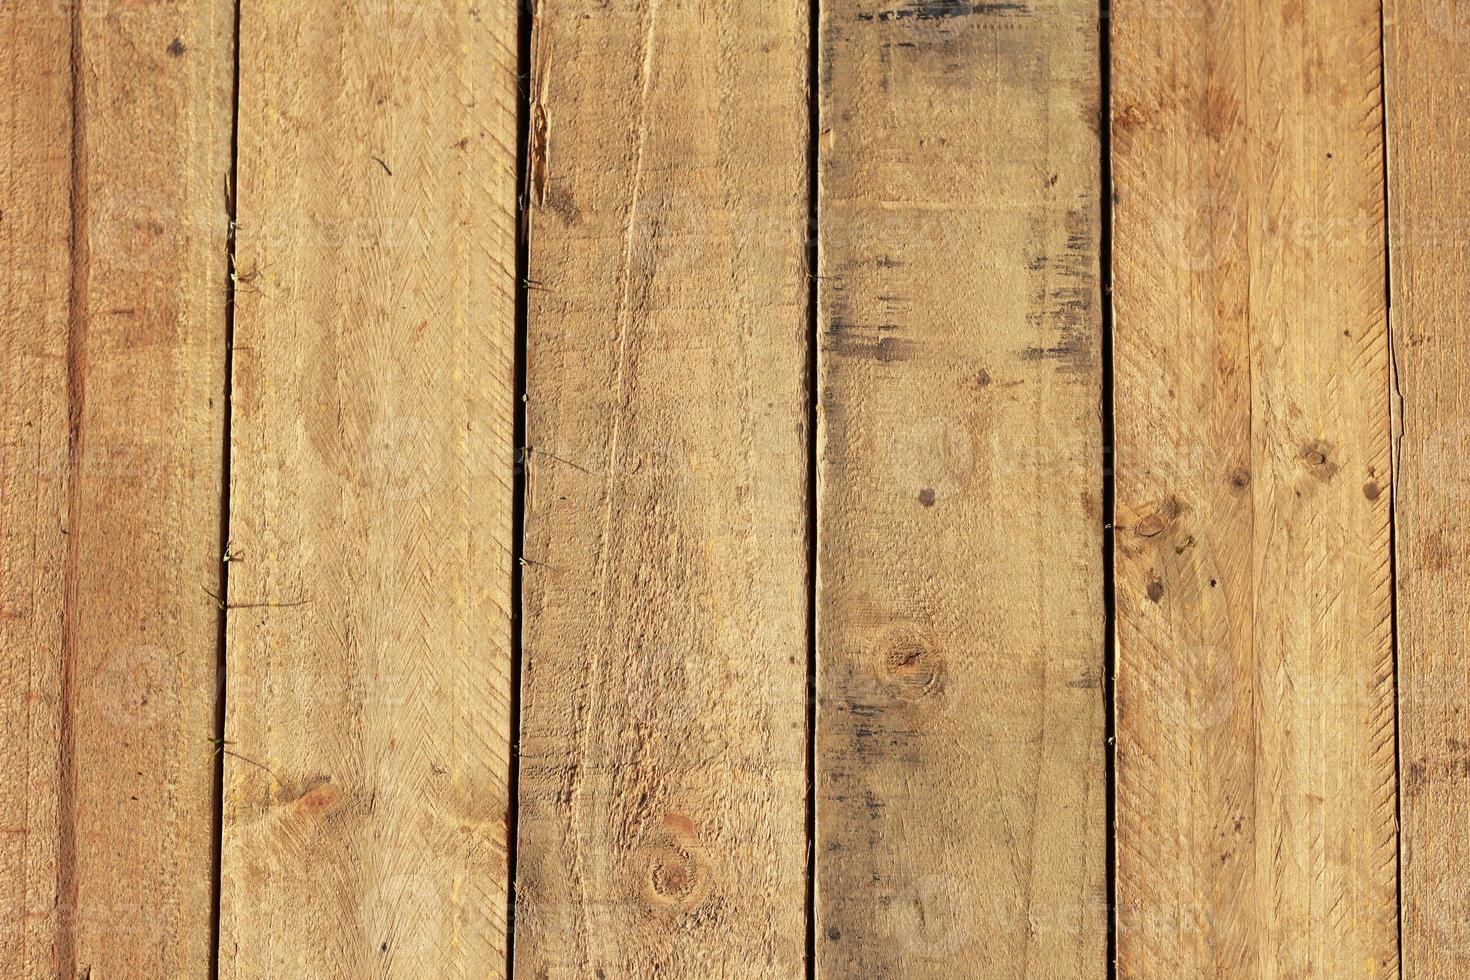 textura de madera / fondo de textura de madera foto